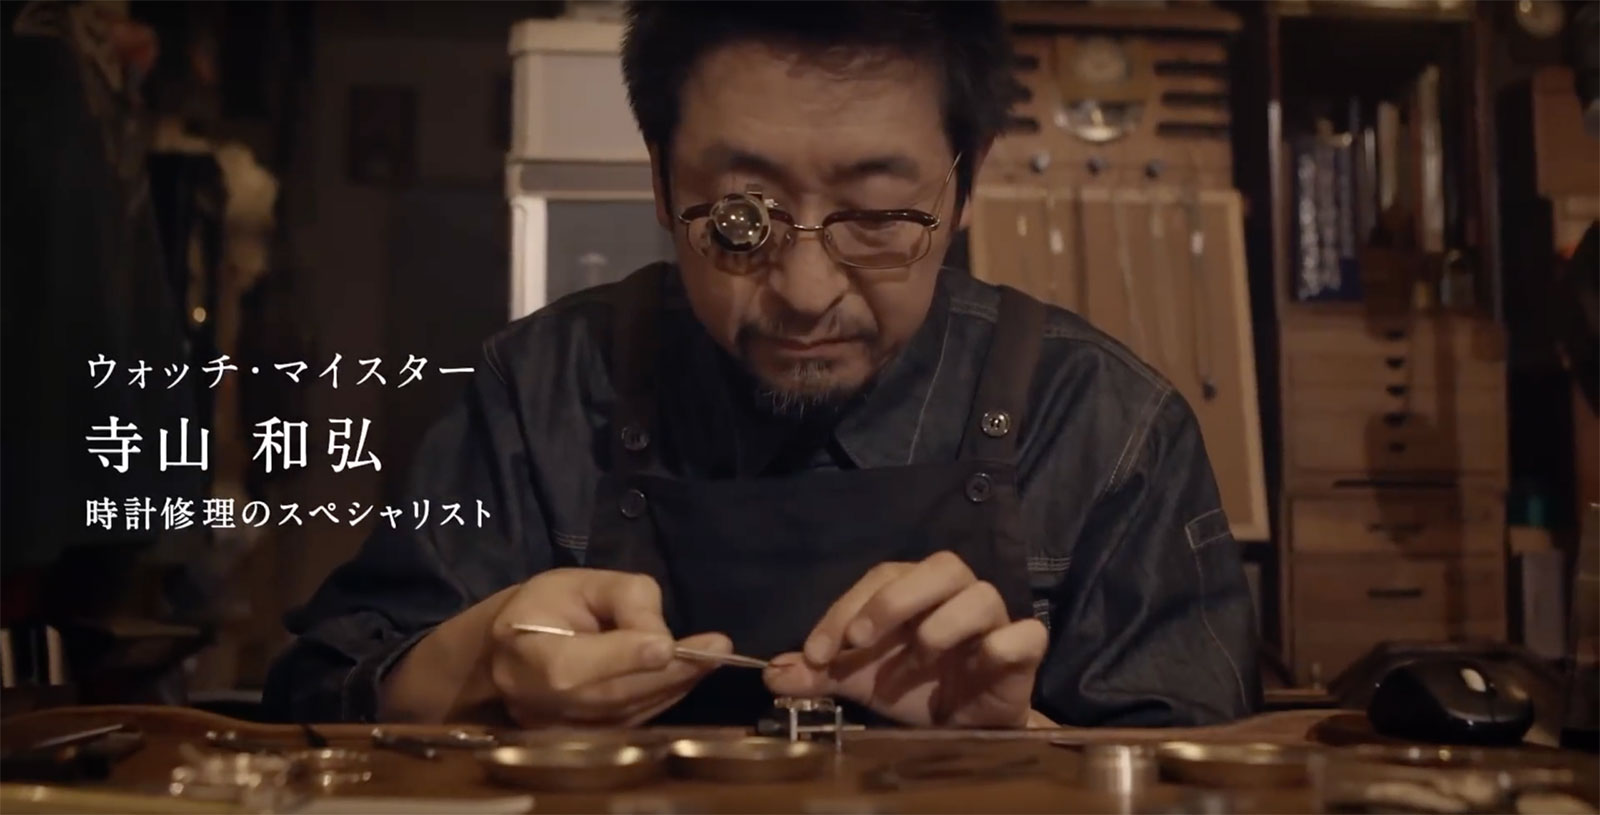 Takii Seed Bento Watch 2